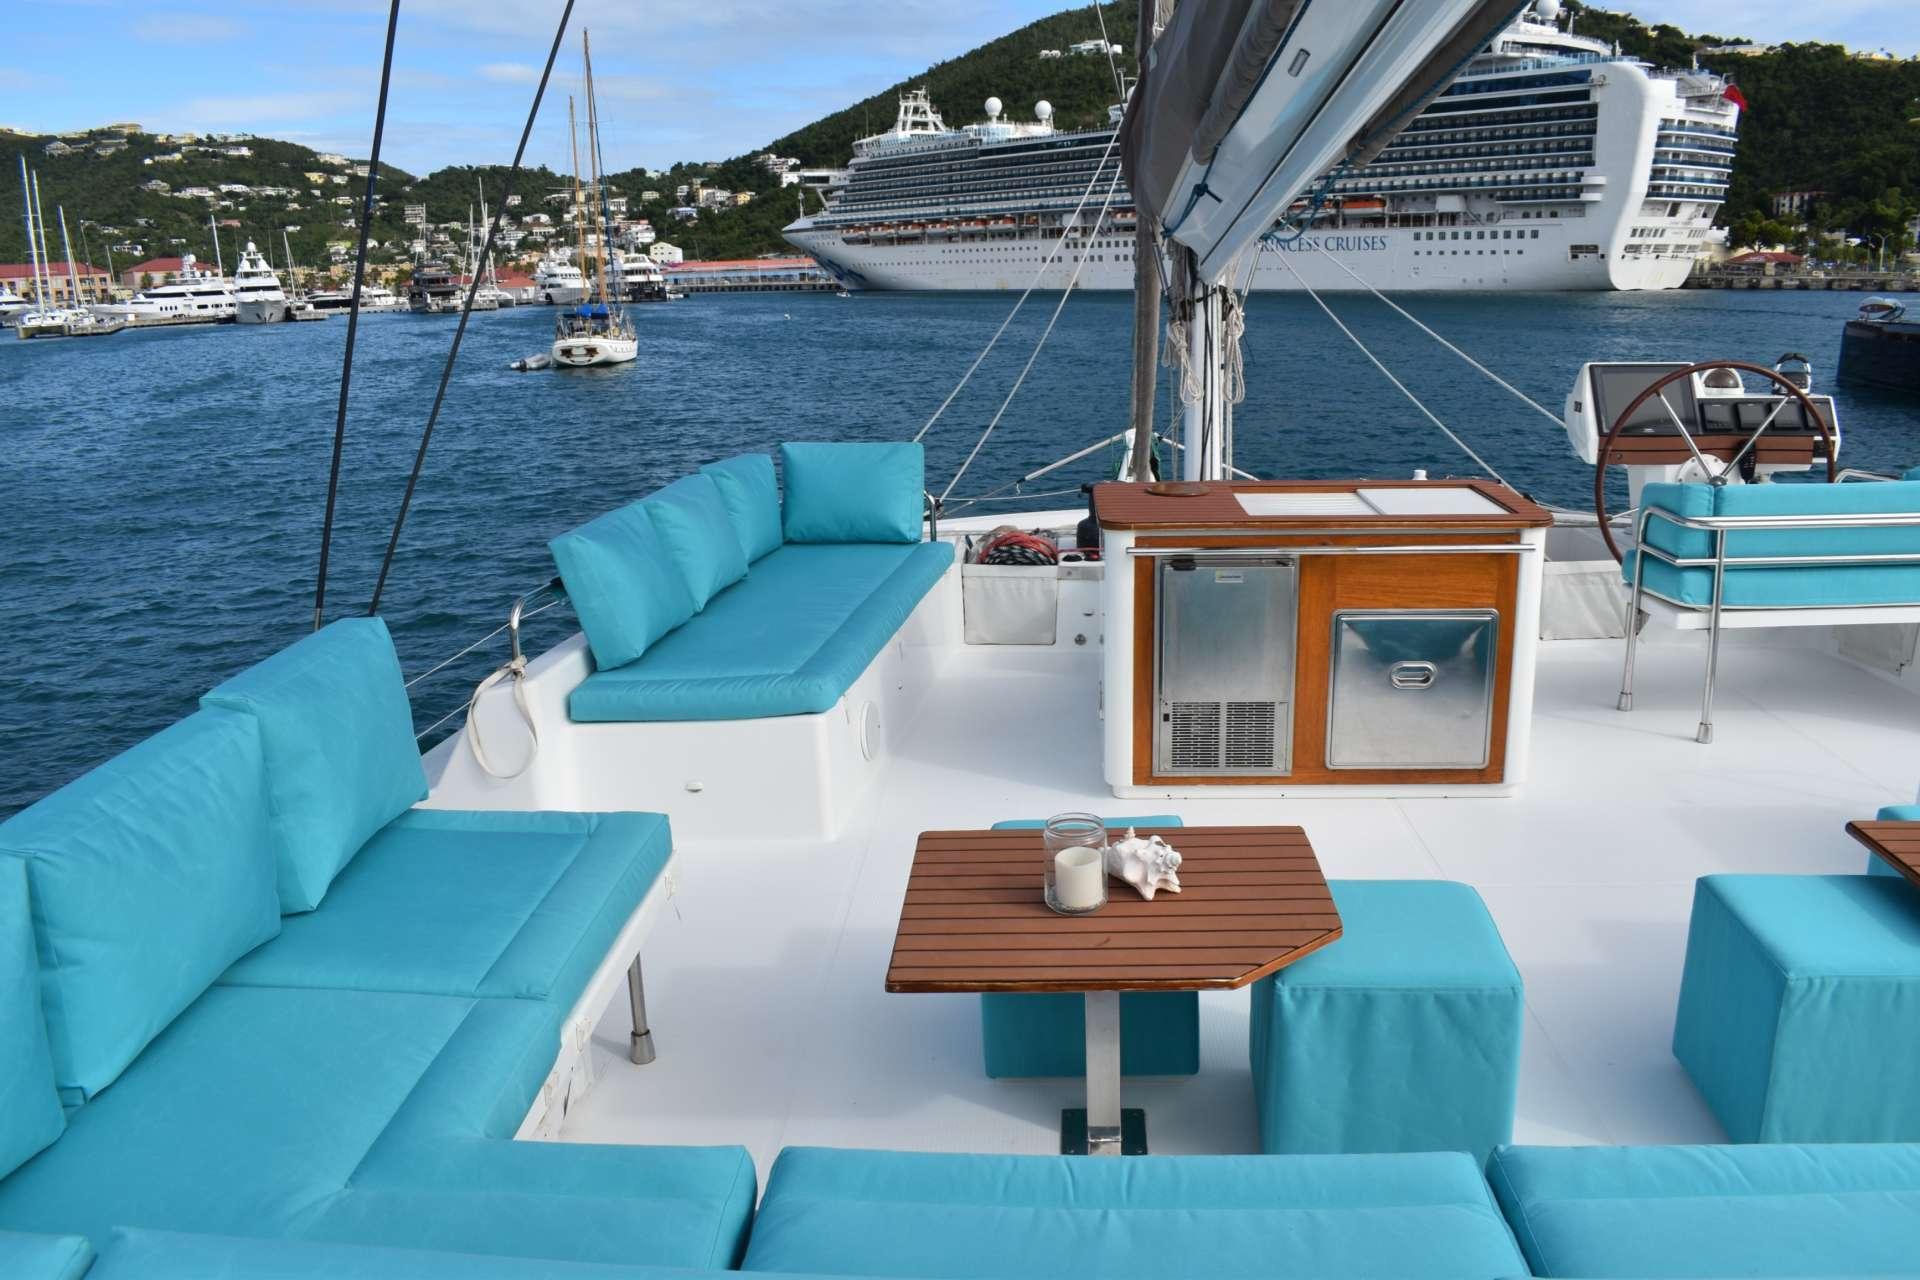 Image of LIR yacht #12